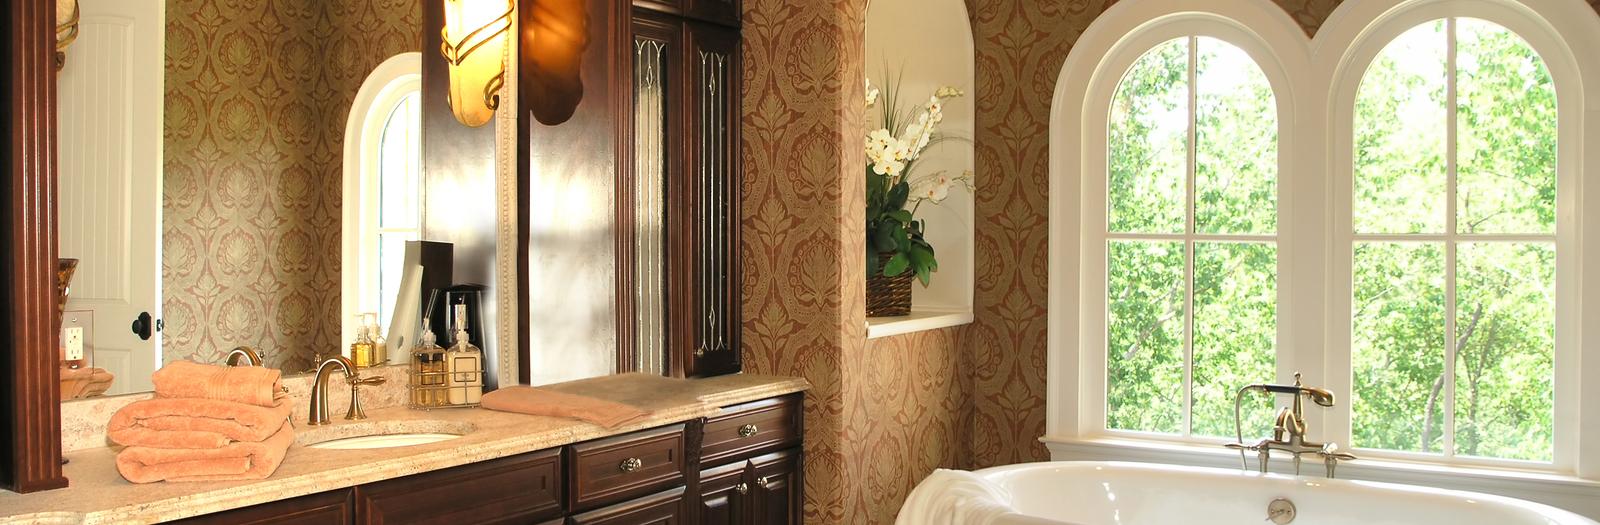 Ideas for home design decorating and remodeling designmine - Affordable interior designer orlando fl ...